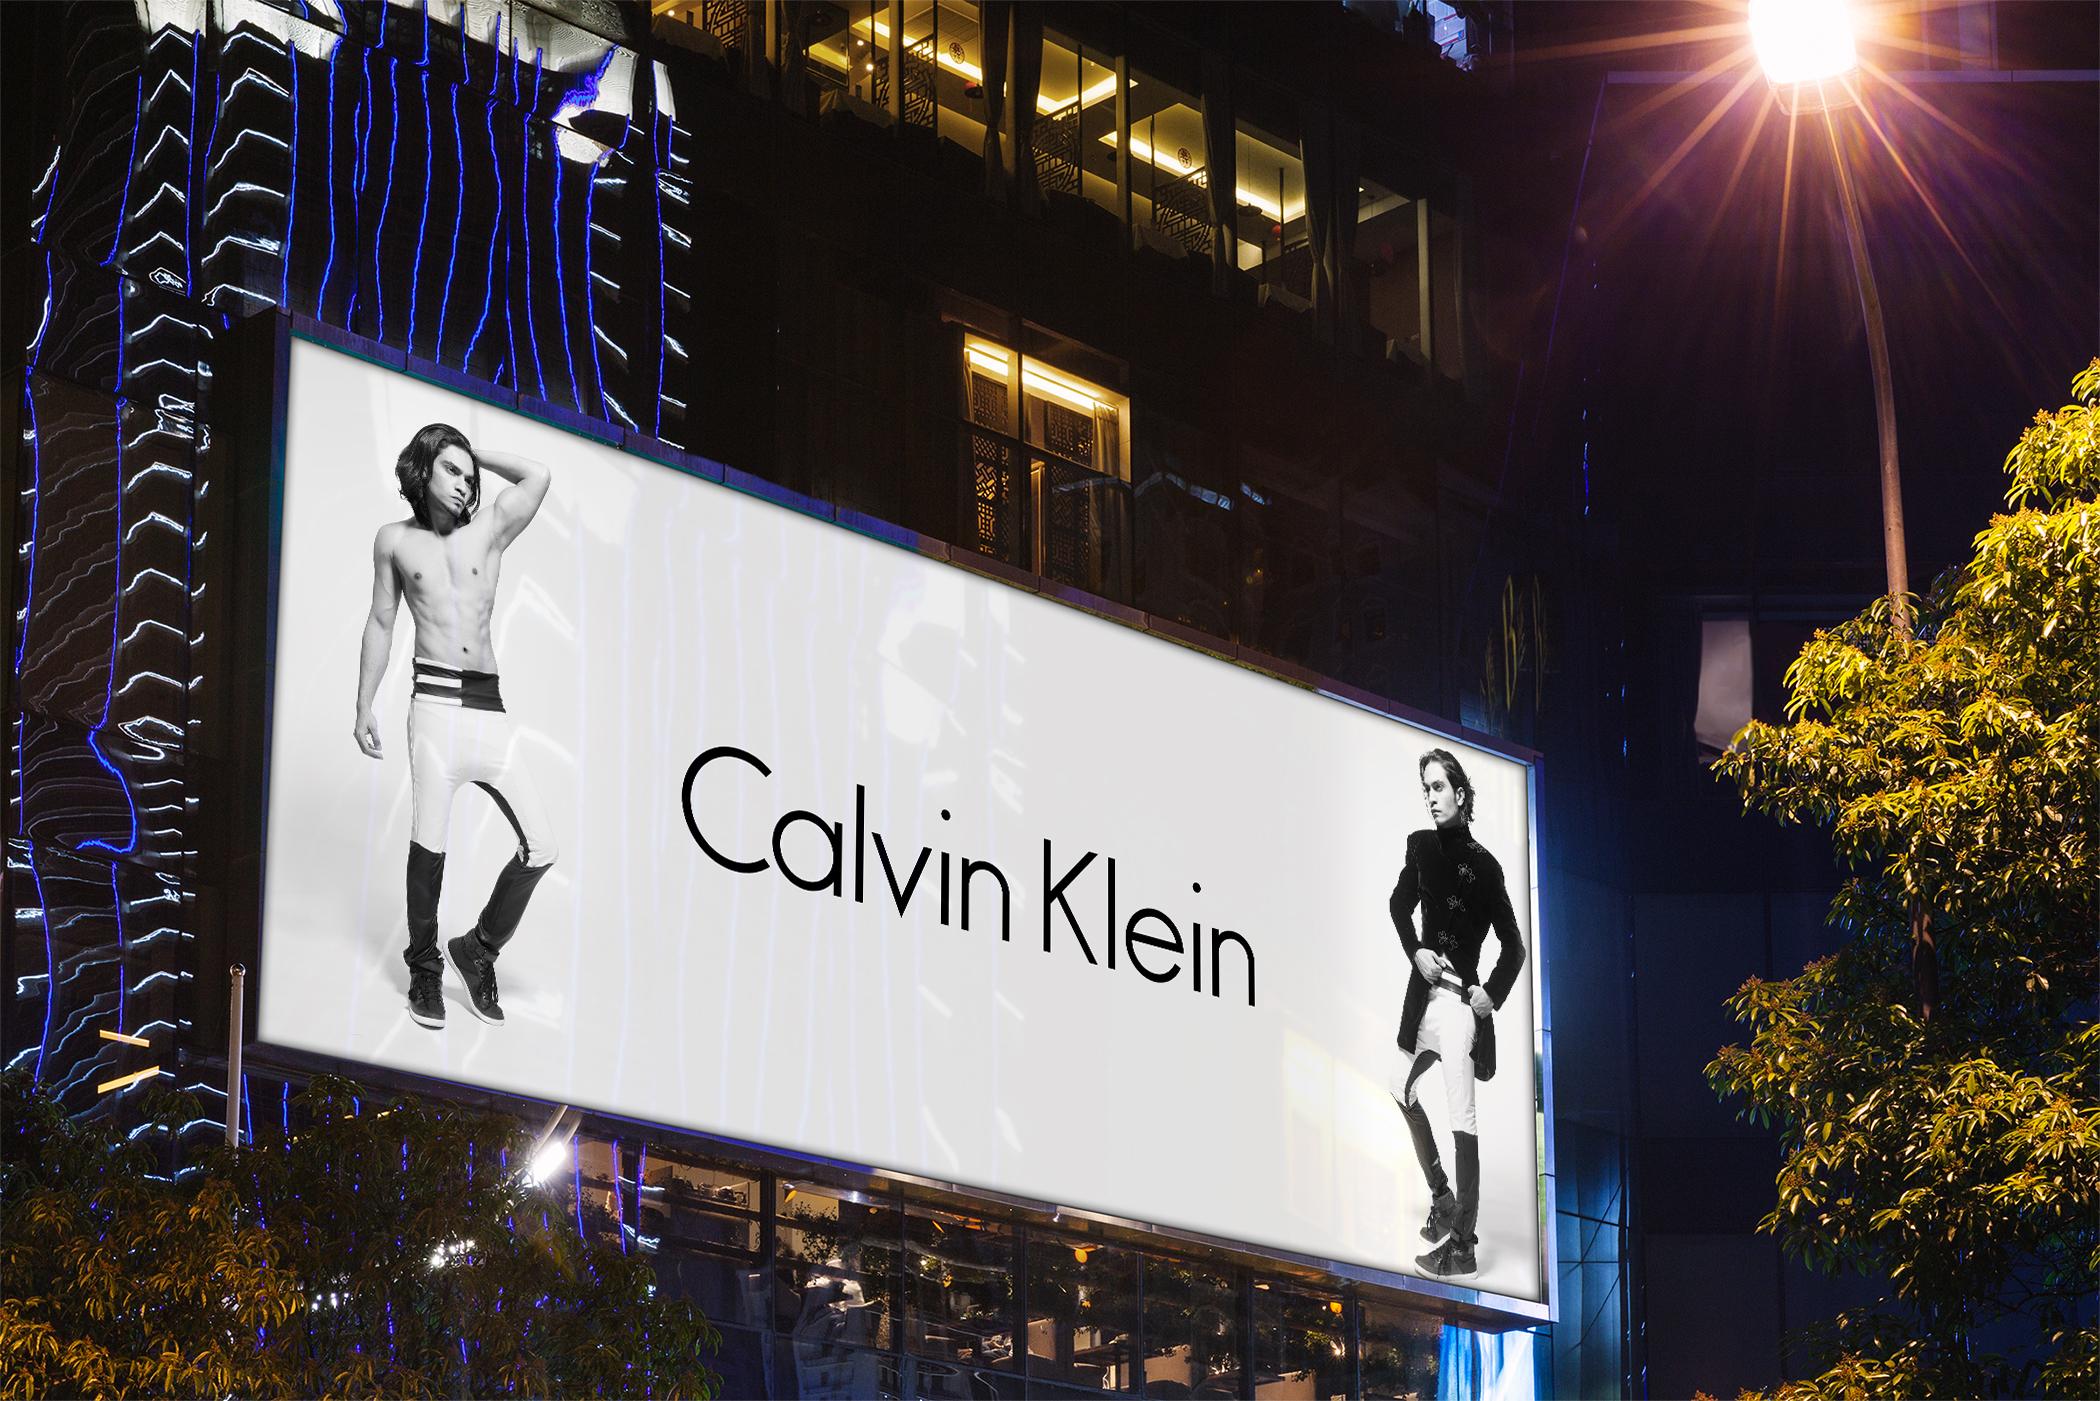 CALVIN_AD1.jpg